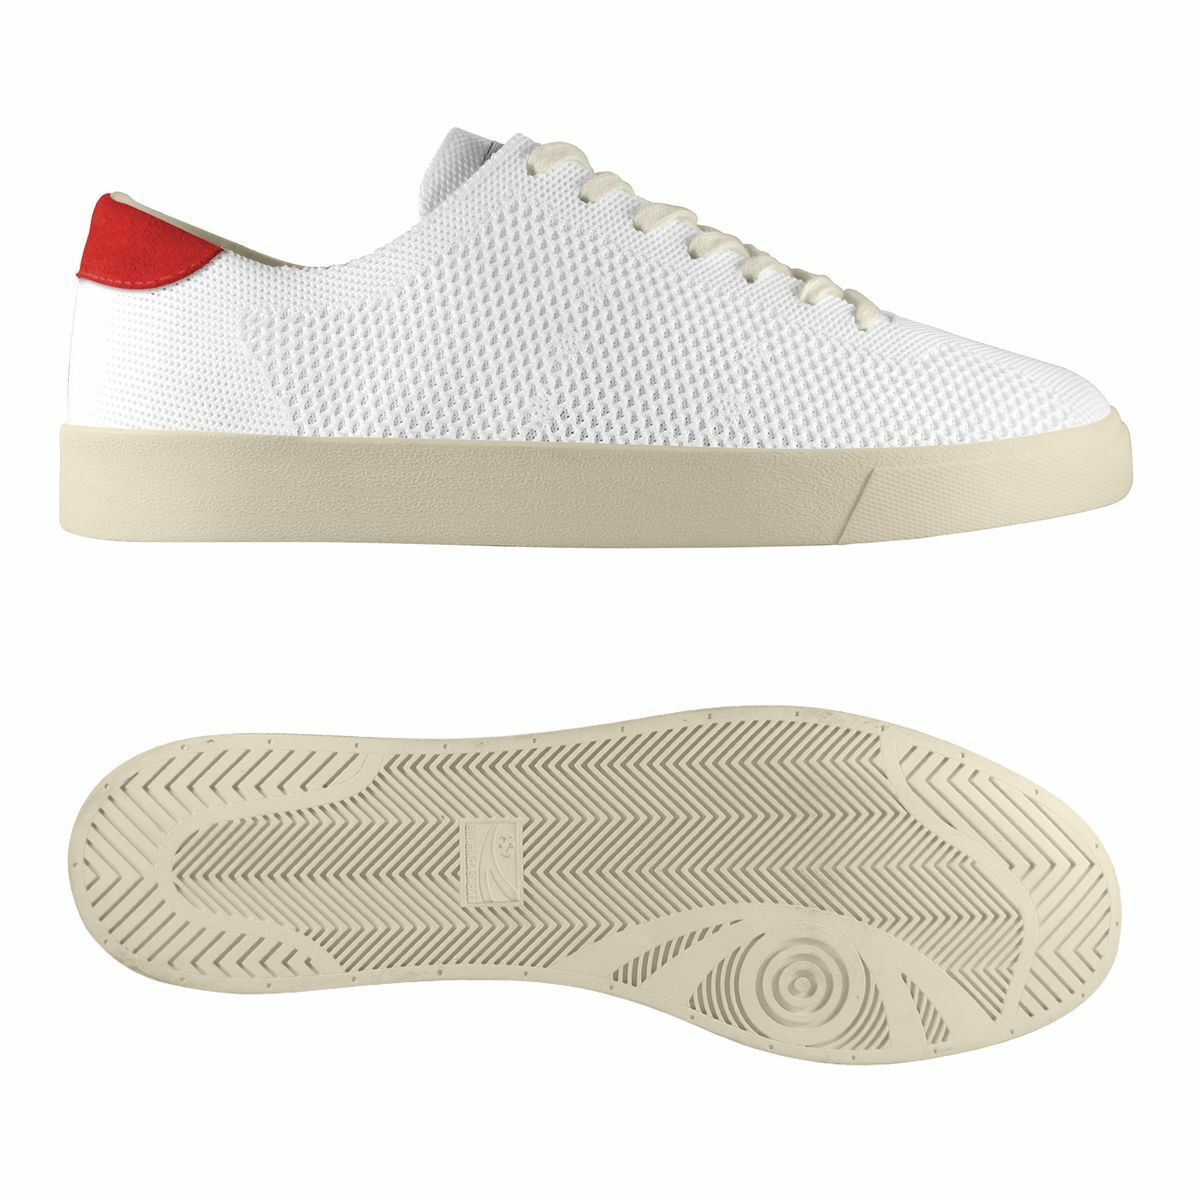 Superga shoes Sneakers Man Woman 2843-KNITTEDPOLYU Tennis sport Low Cut